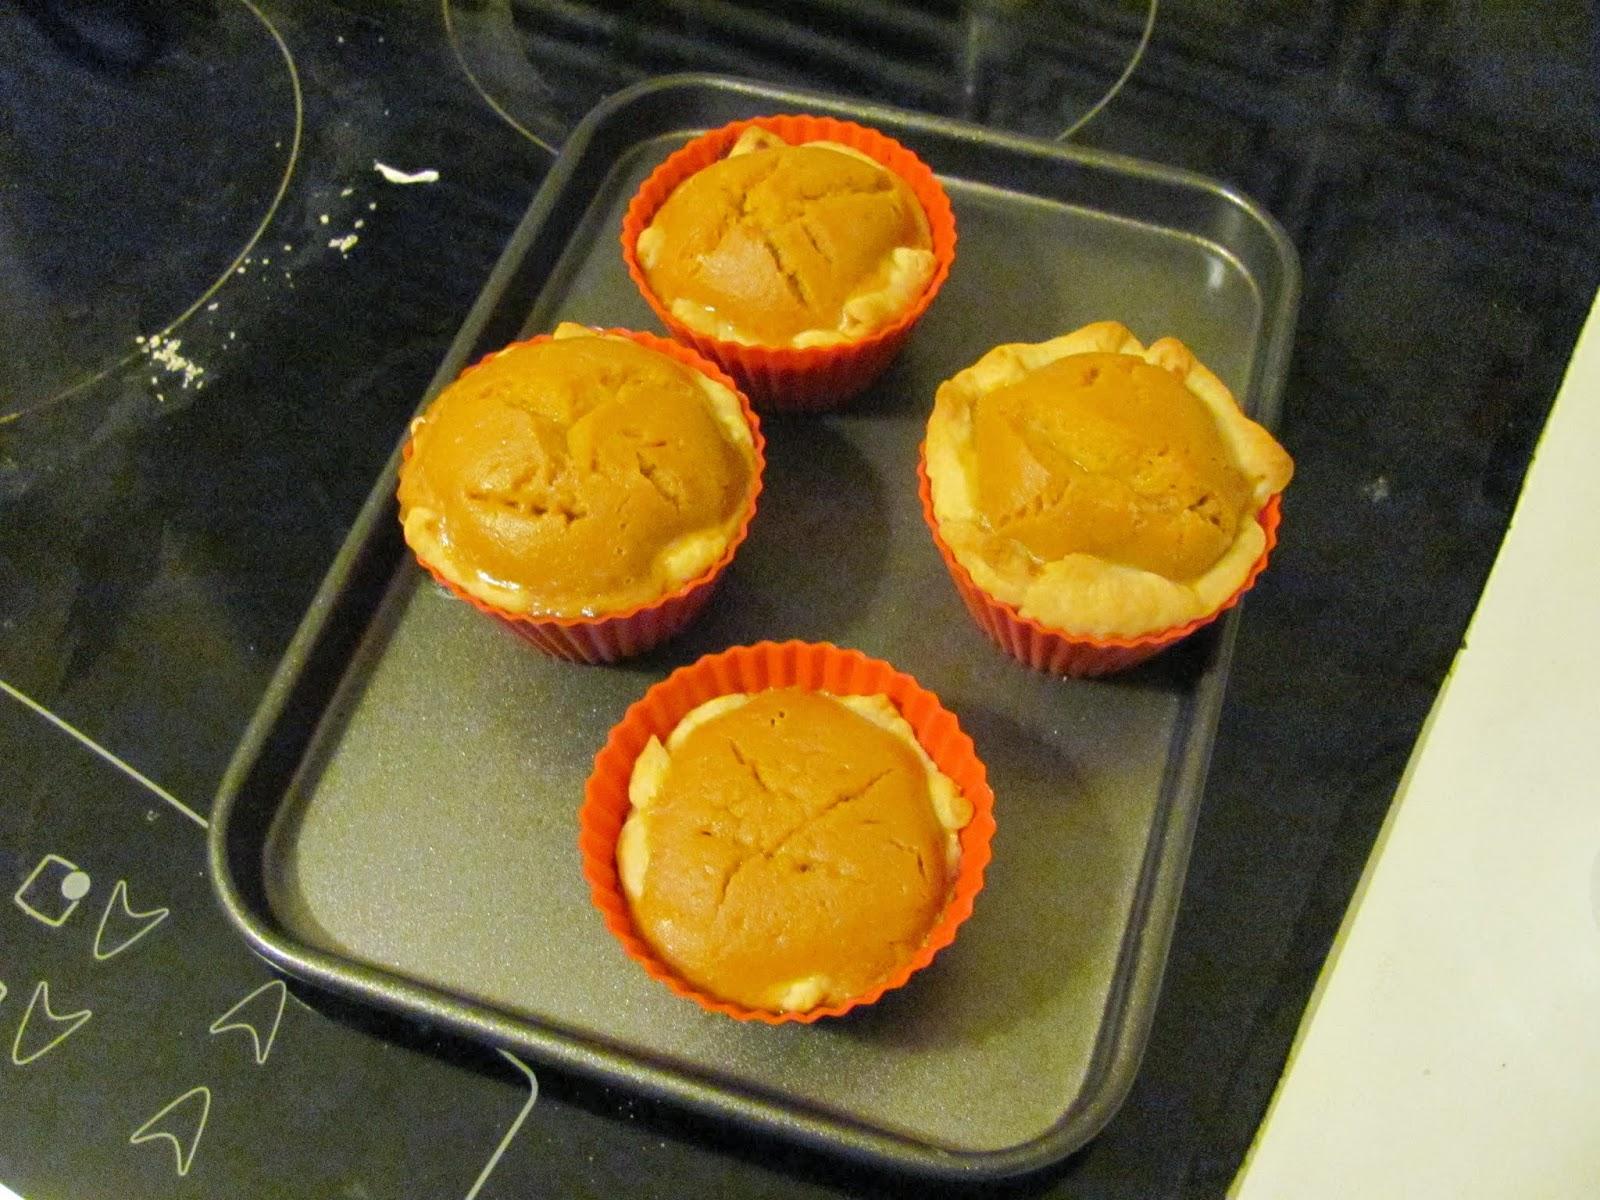 Mini pumpkin pies in Dublin Ireland Thanksgiving 2013